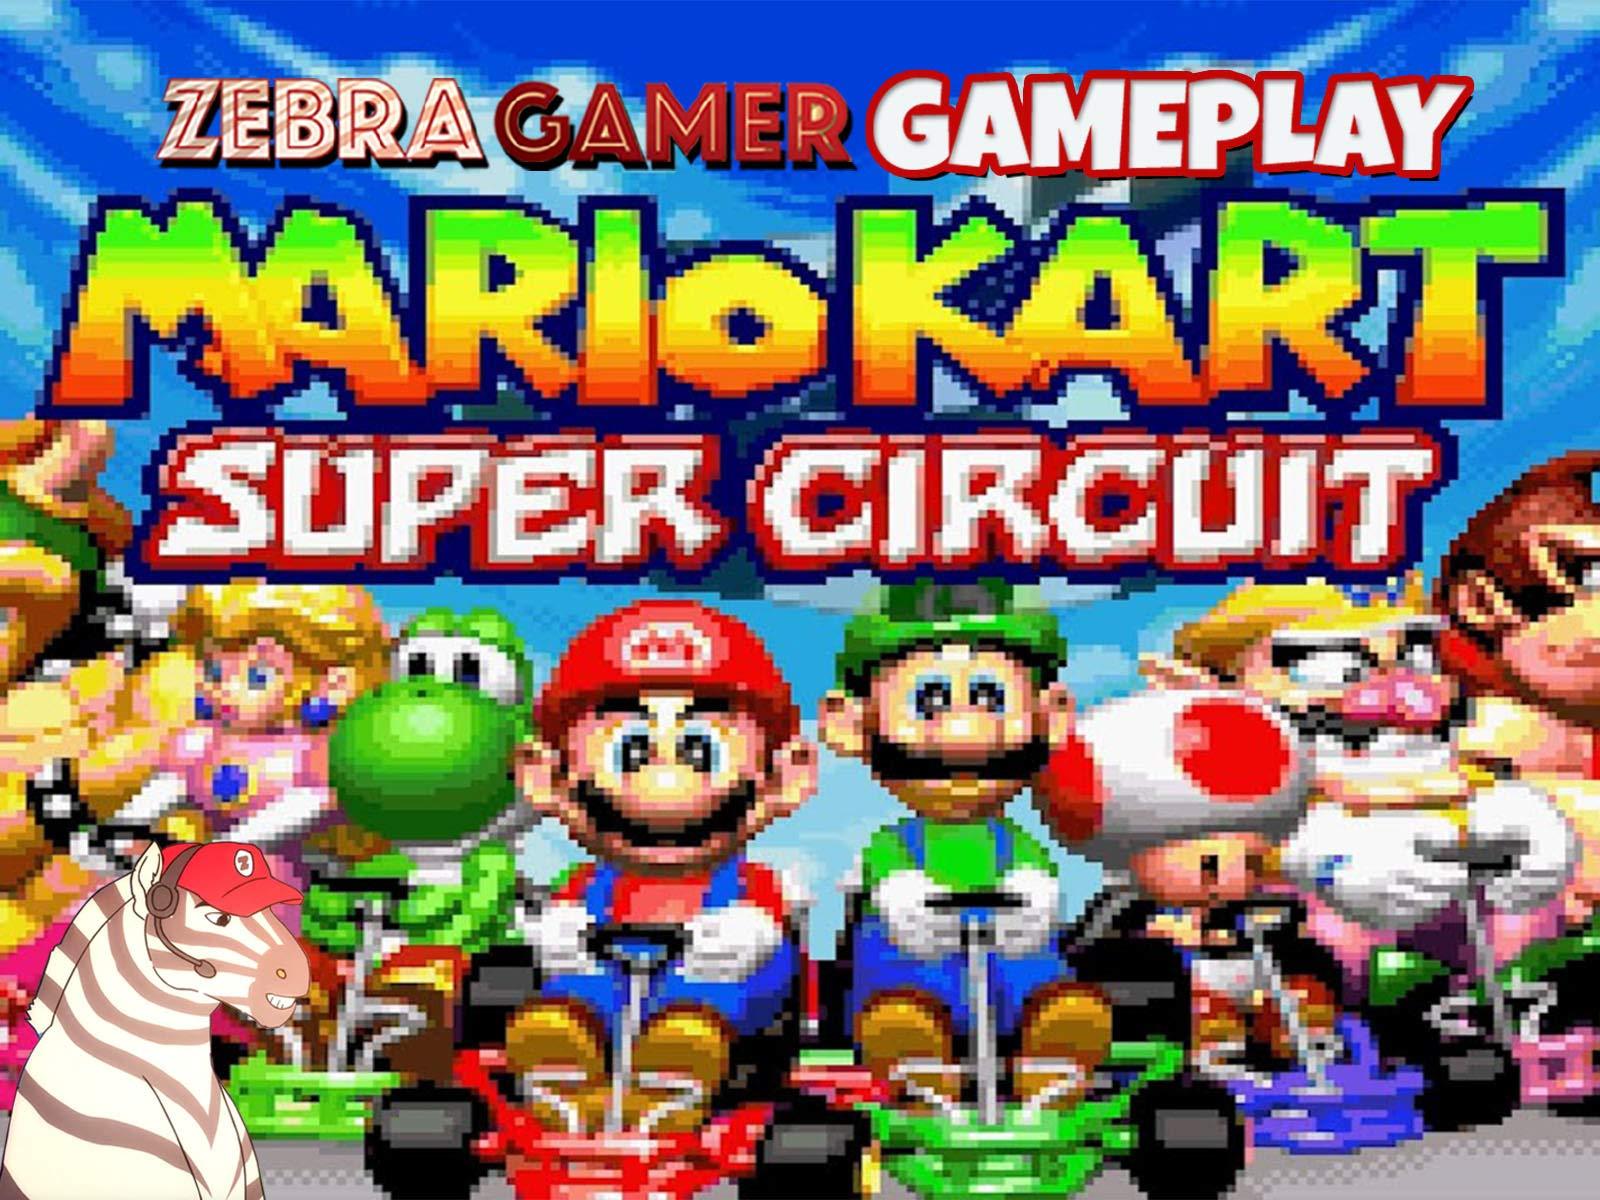 Clip: Mario Kart Super Circuit Gameplay - Zebra Gamer - Season 1